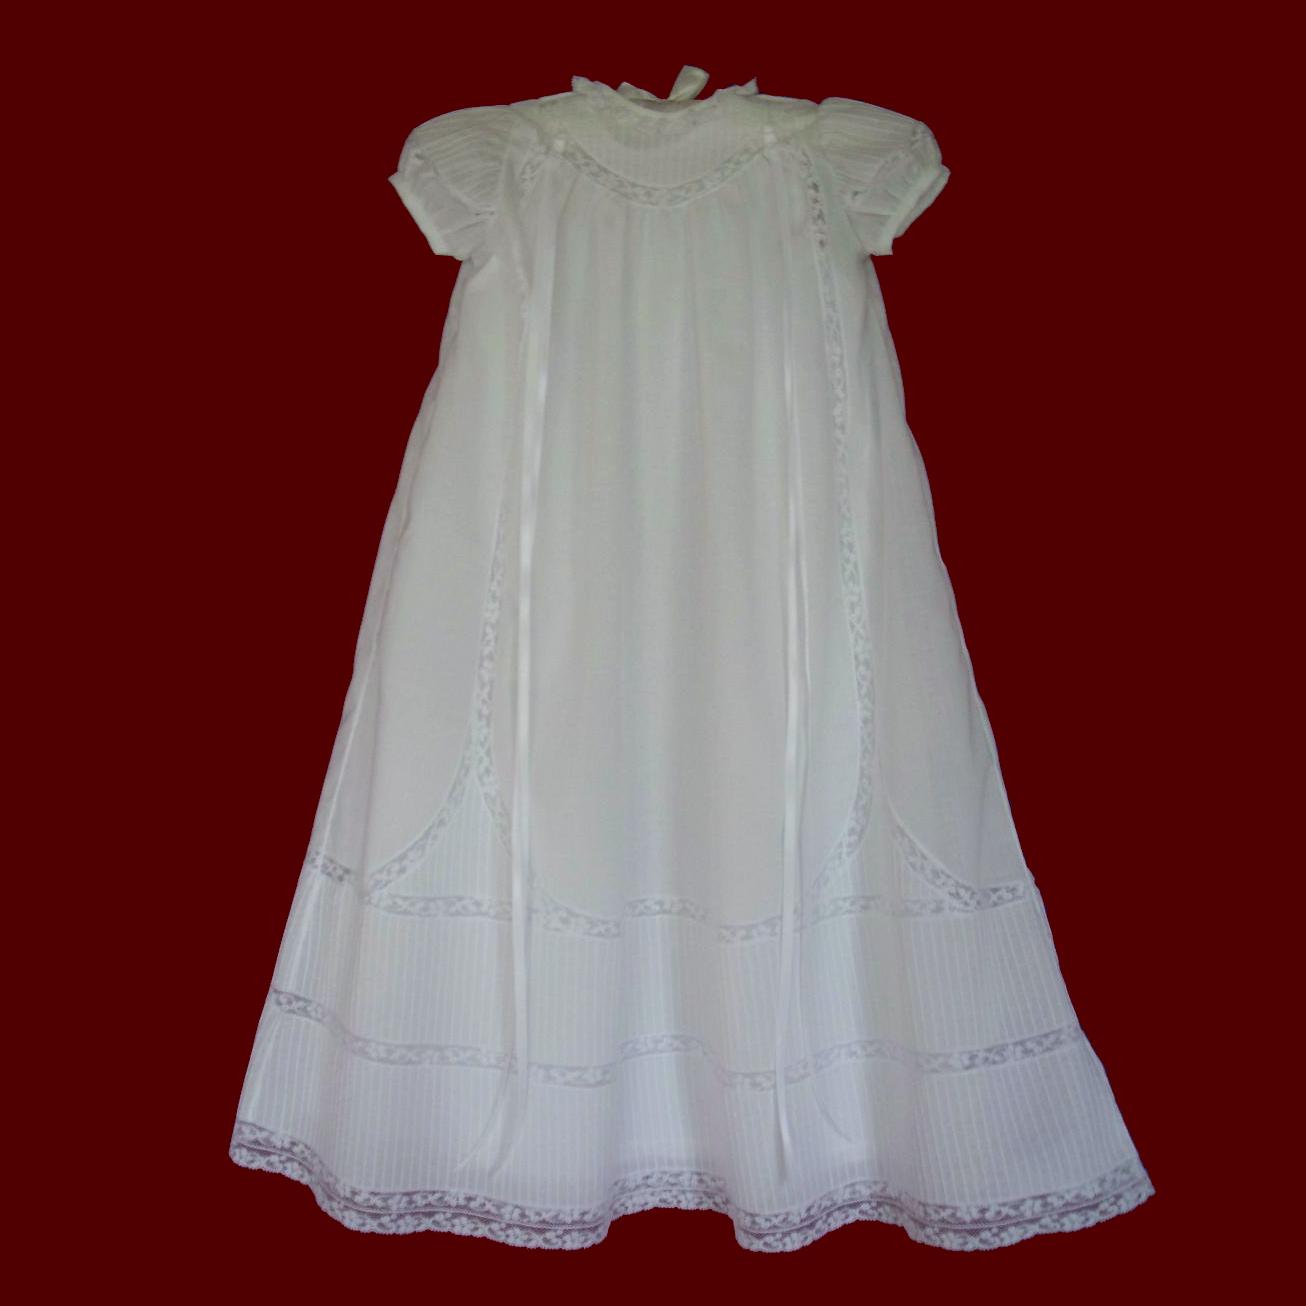 1d731cd9755f Pintucks & Lace Heirloom Christening Gown, Slip & Bonnet - Girls ...